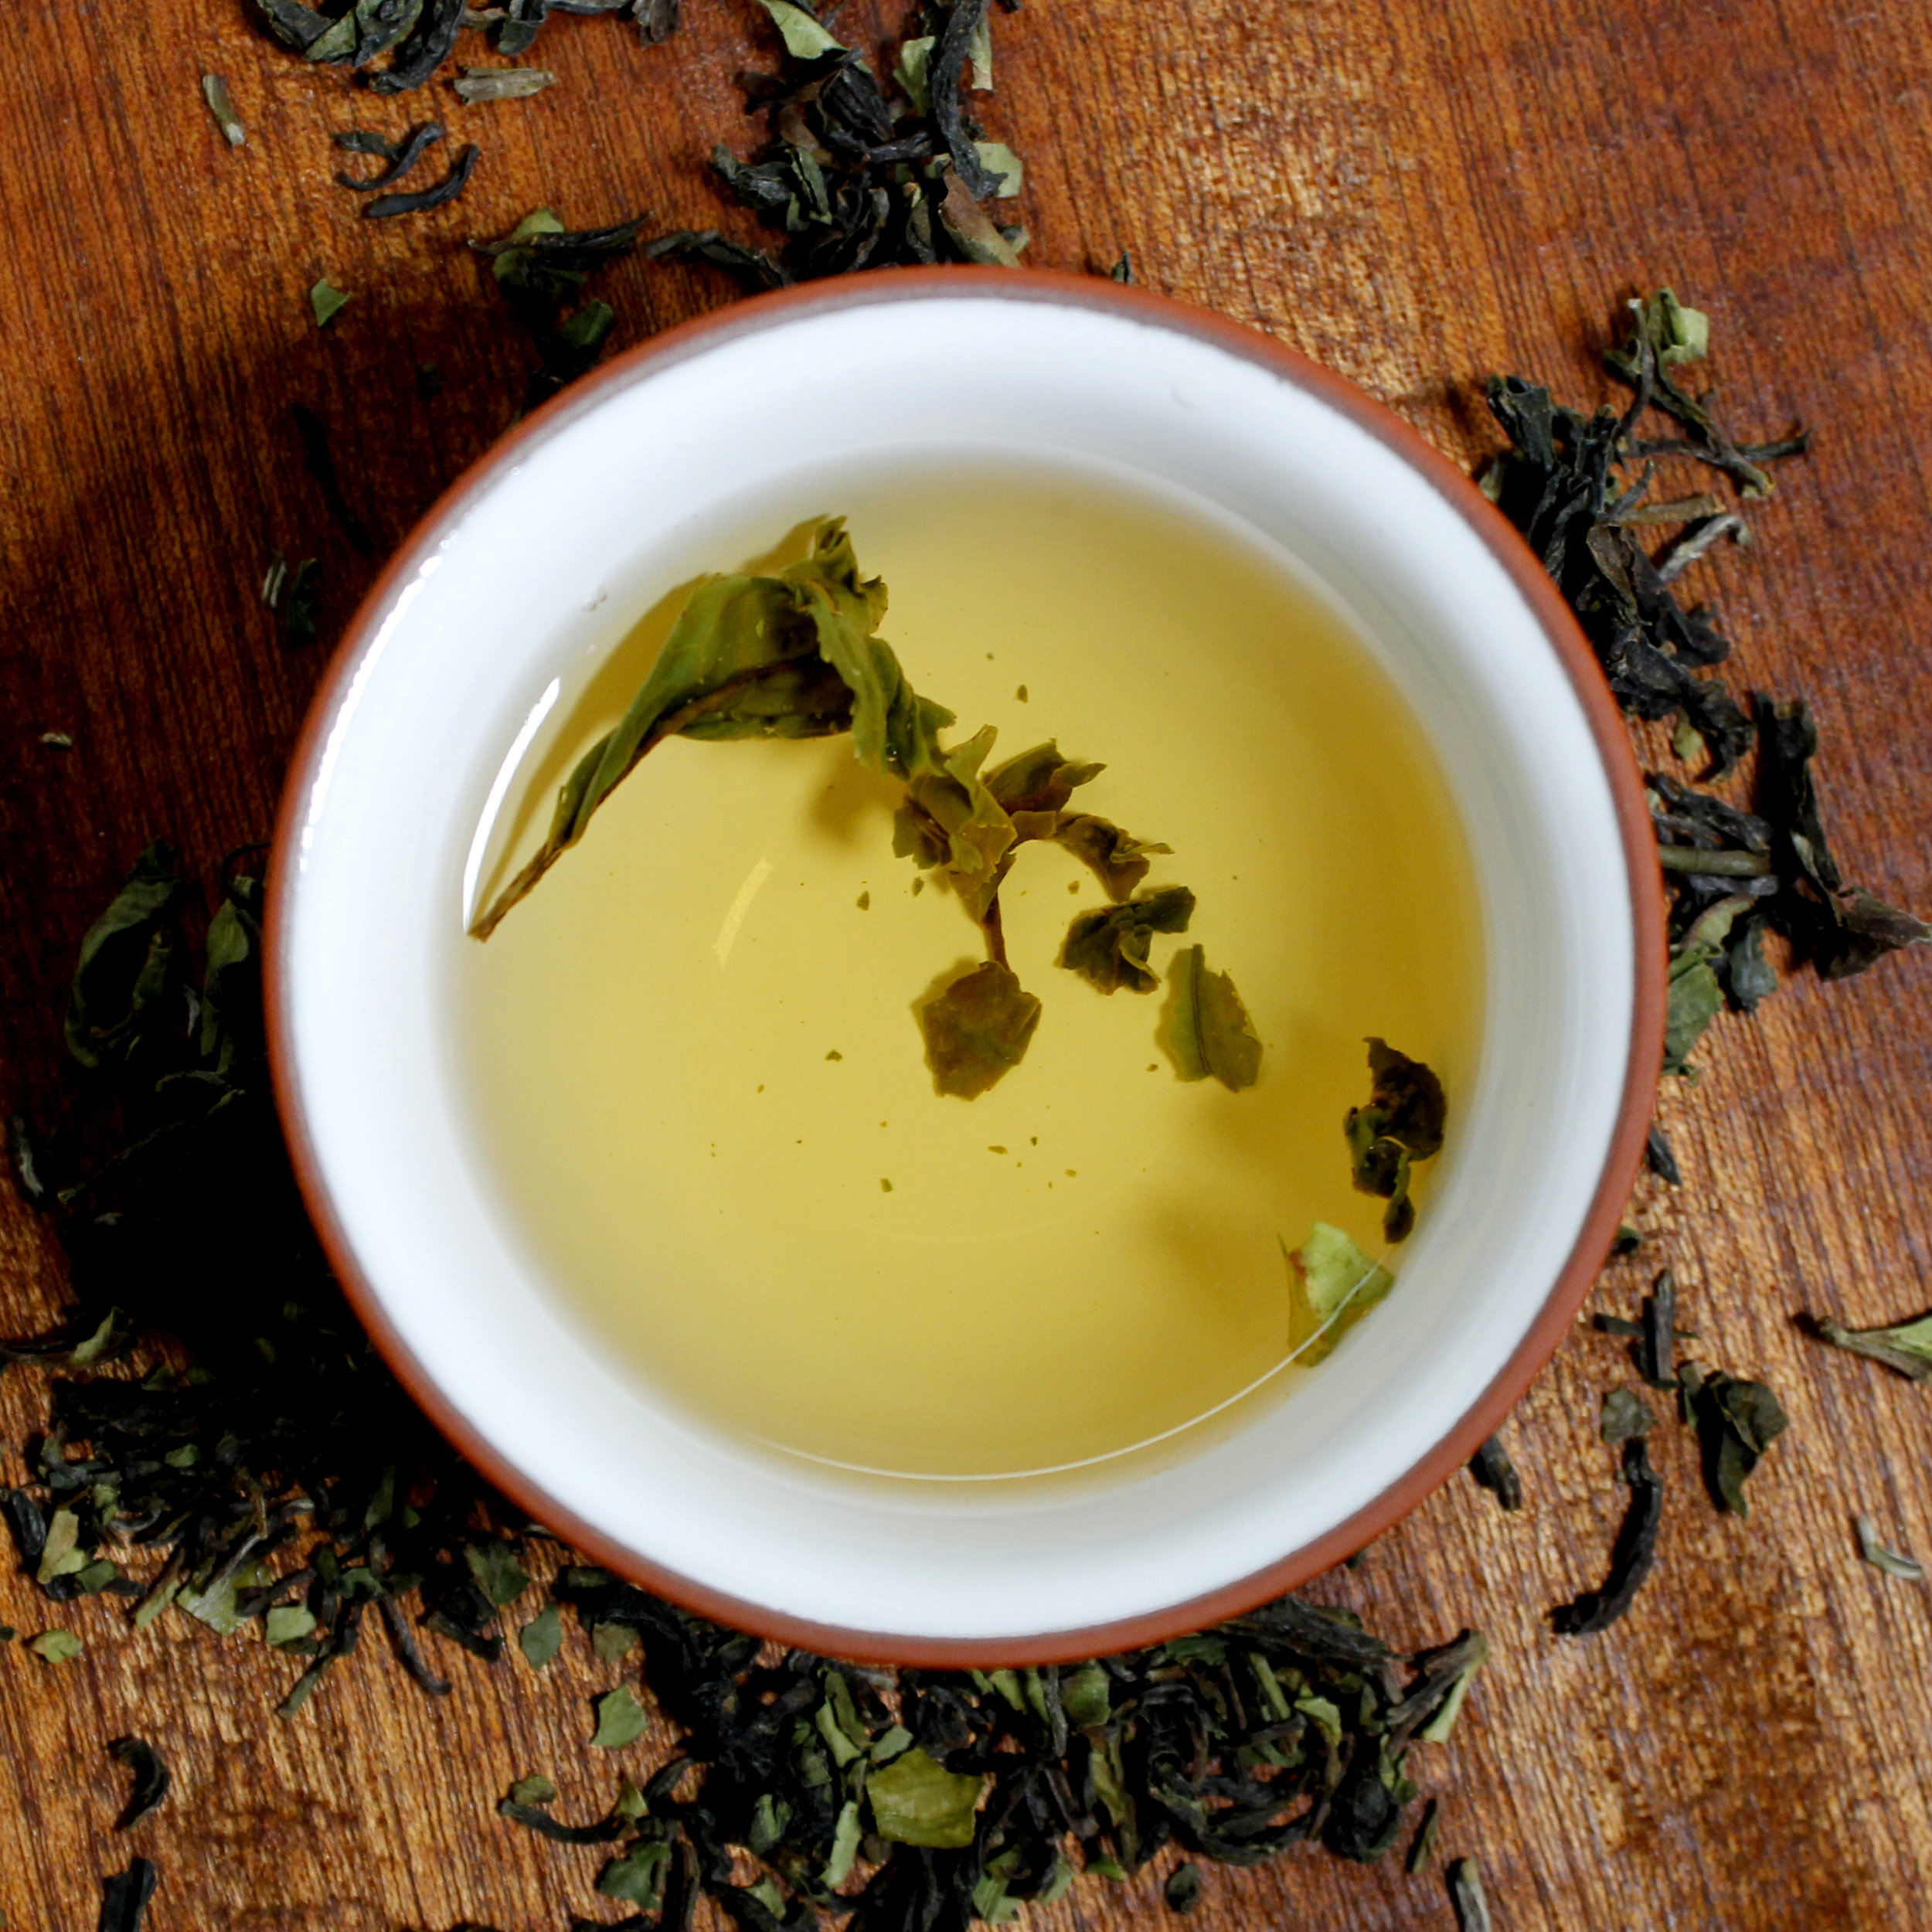 darjeeling-1st-flush-jungpana-estate-wonder-muscatel-black-whole-leaf-tea-itw3.jpg